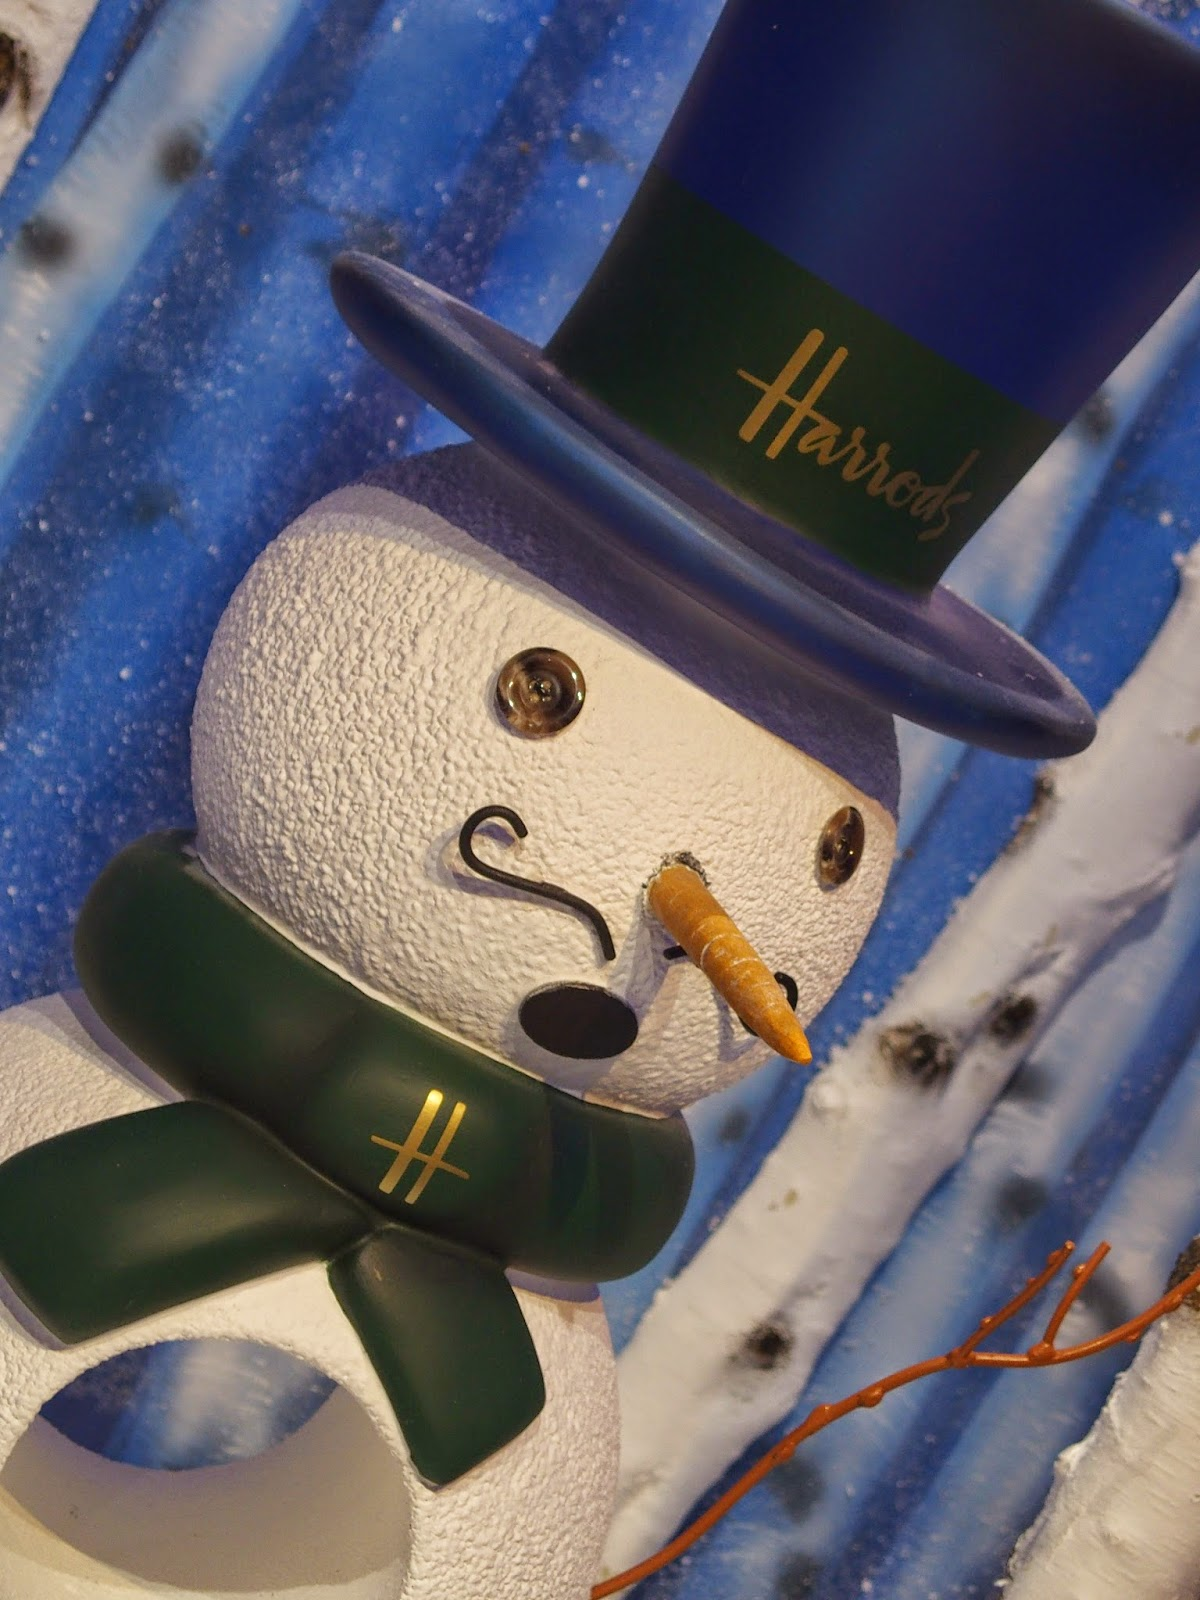 Harrods Christmas